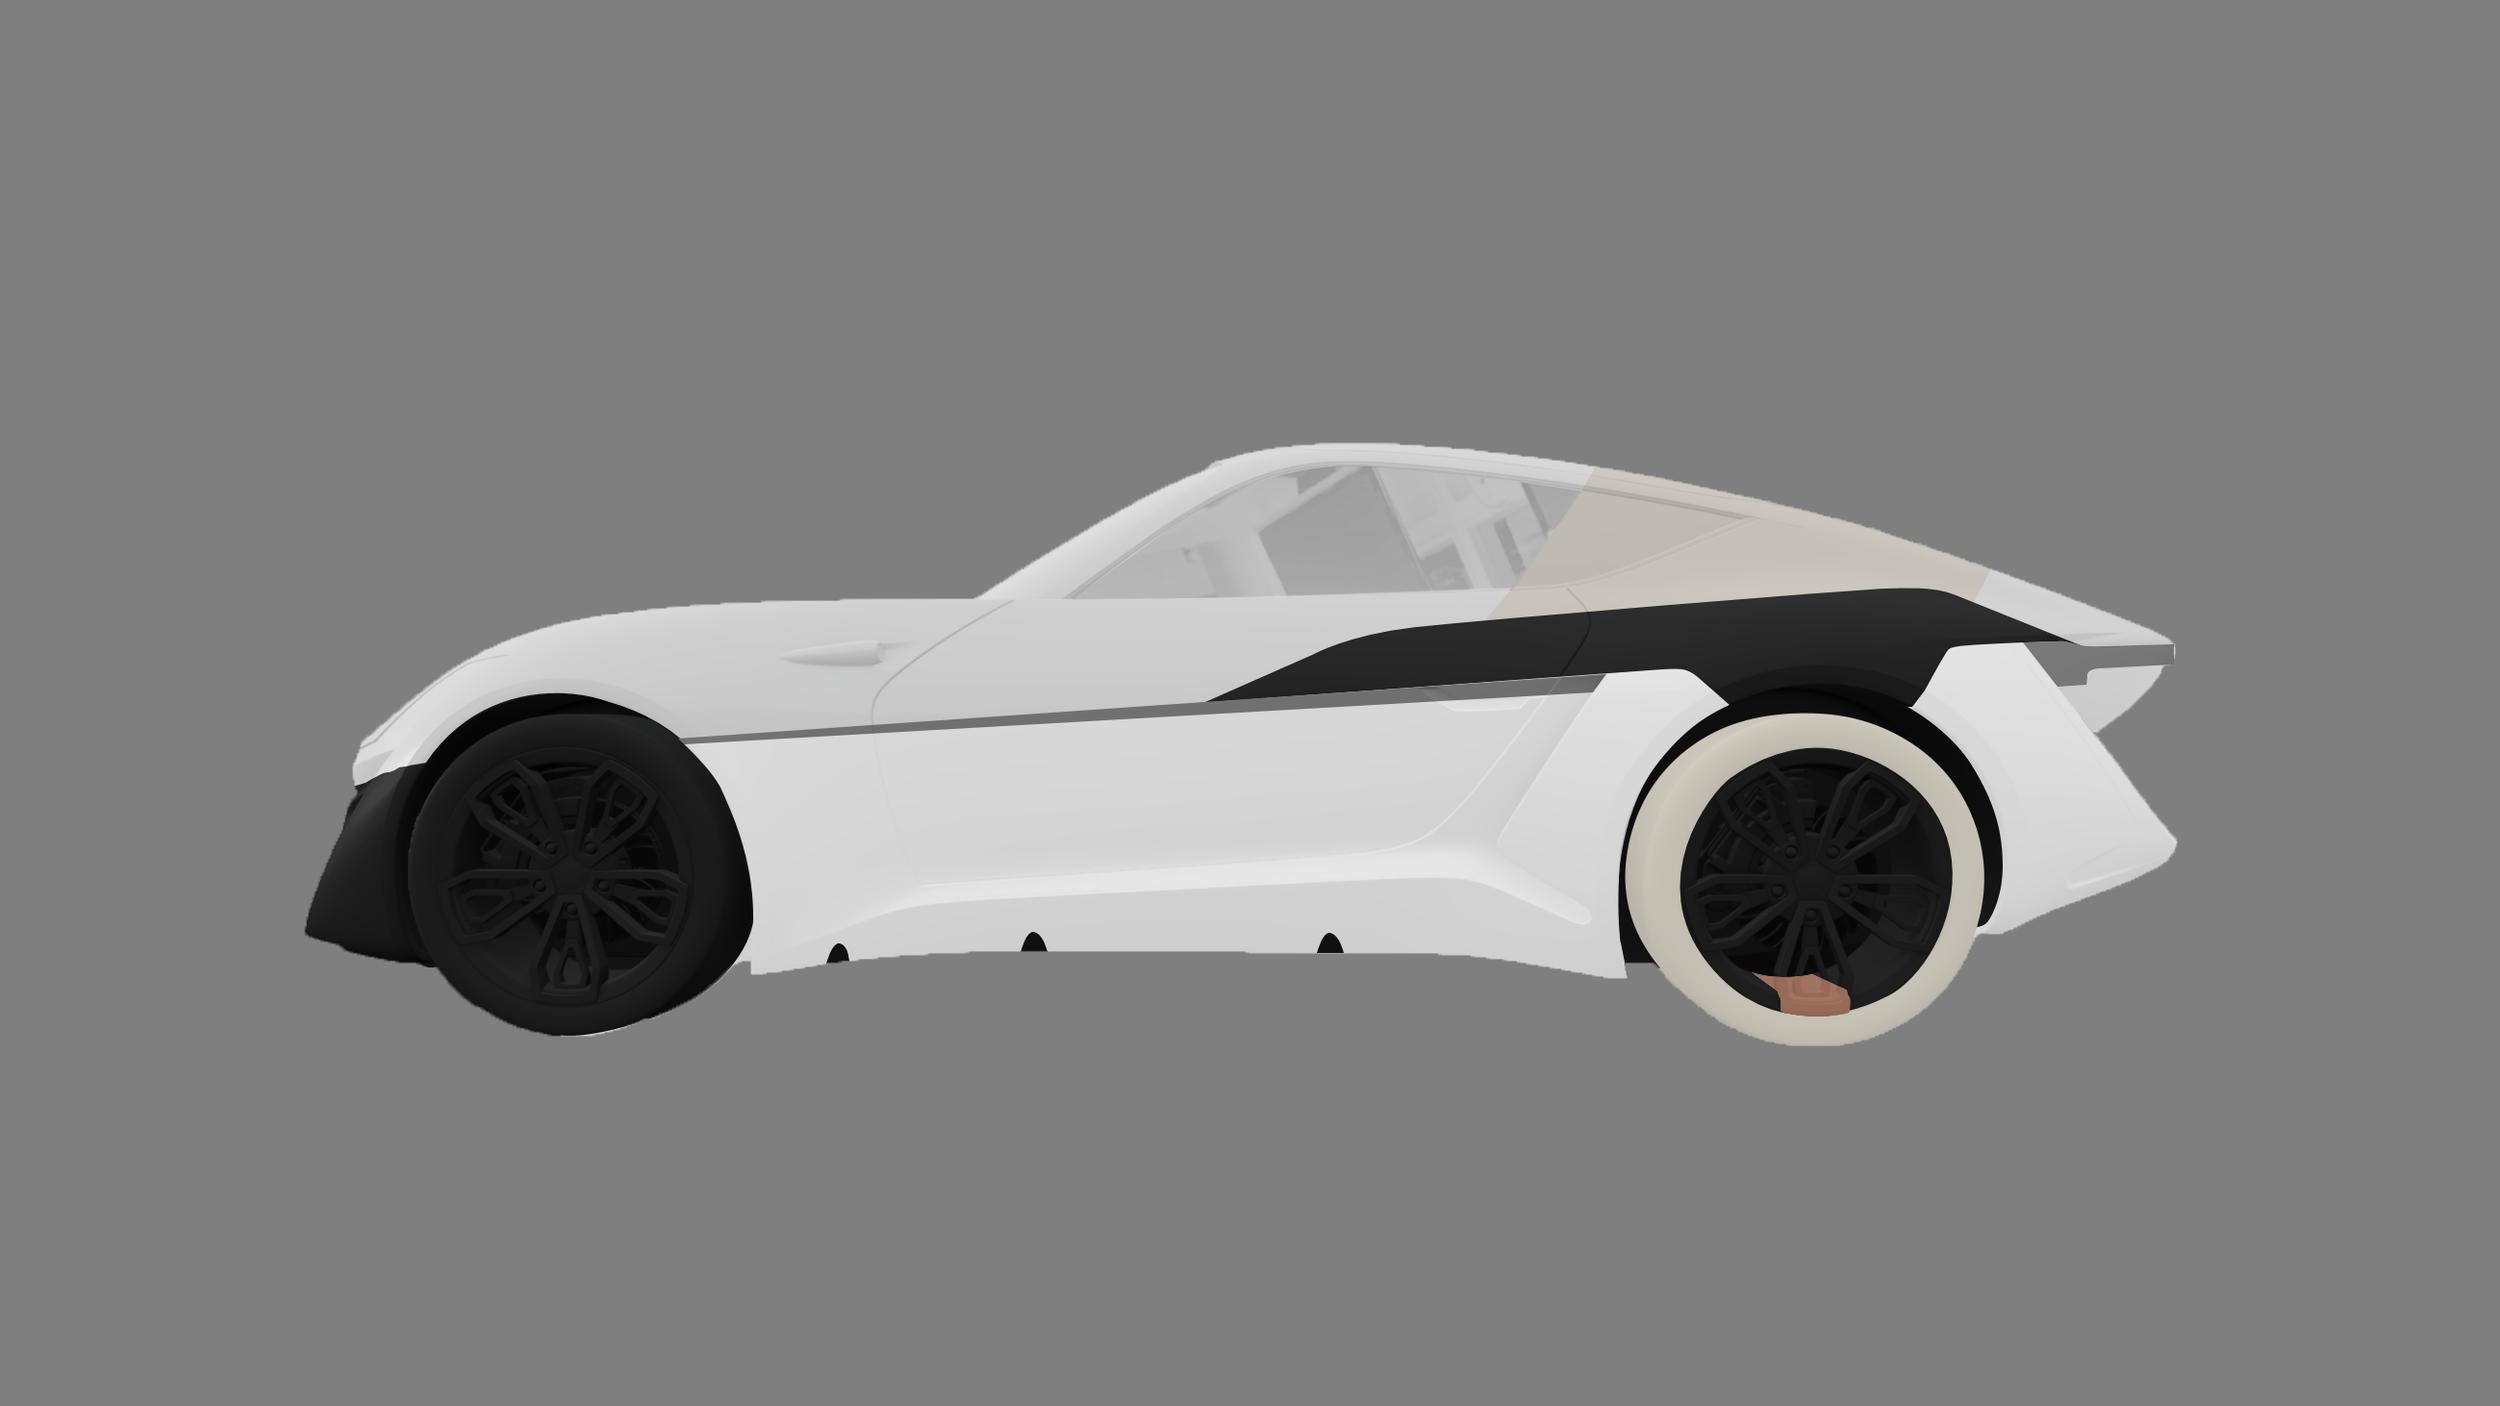 thomas charier xtaon contest concept car sketch design side